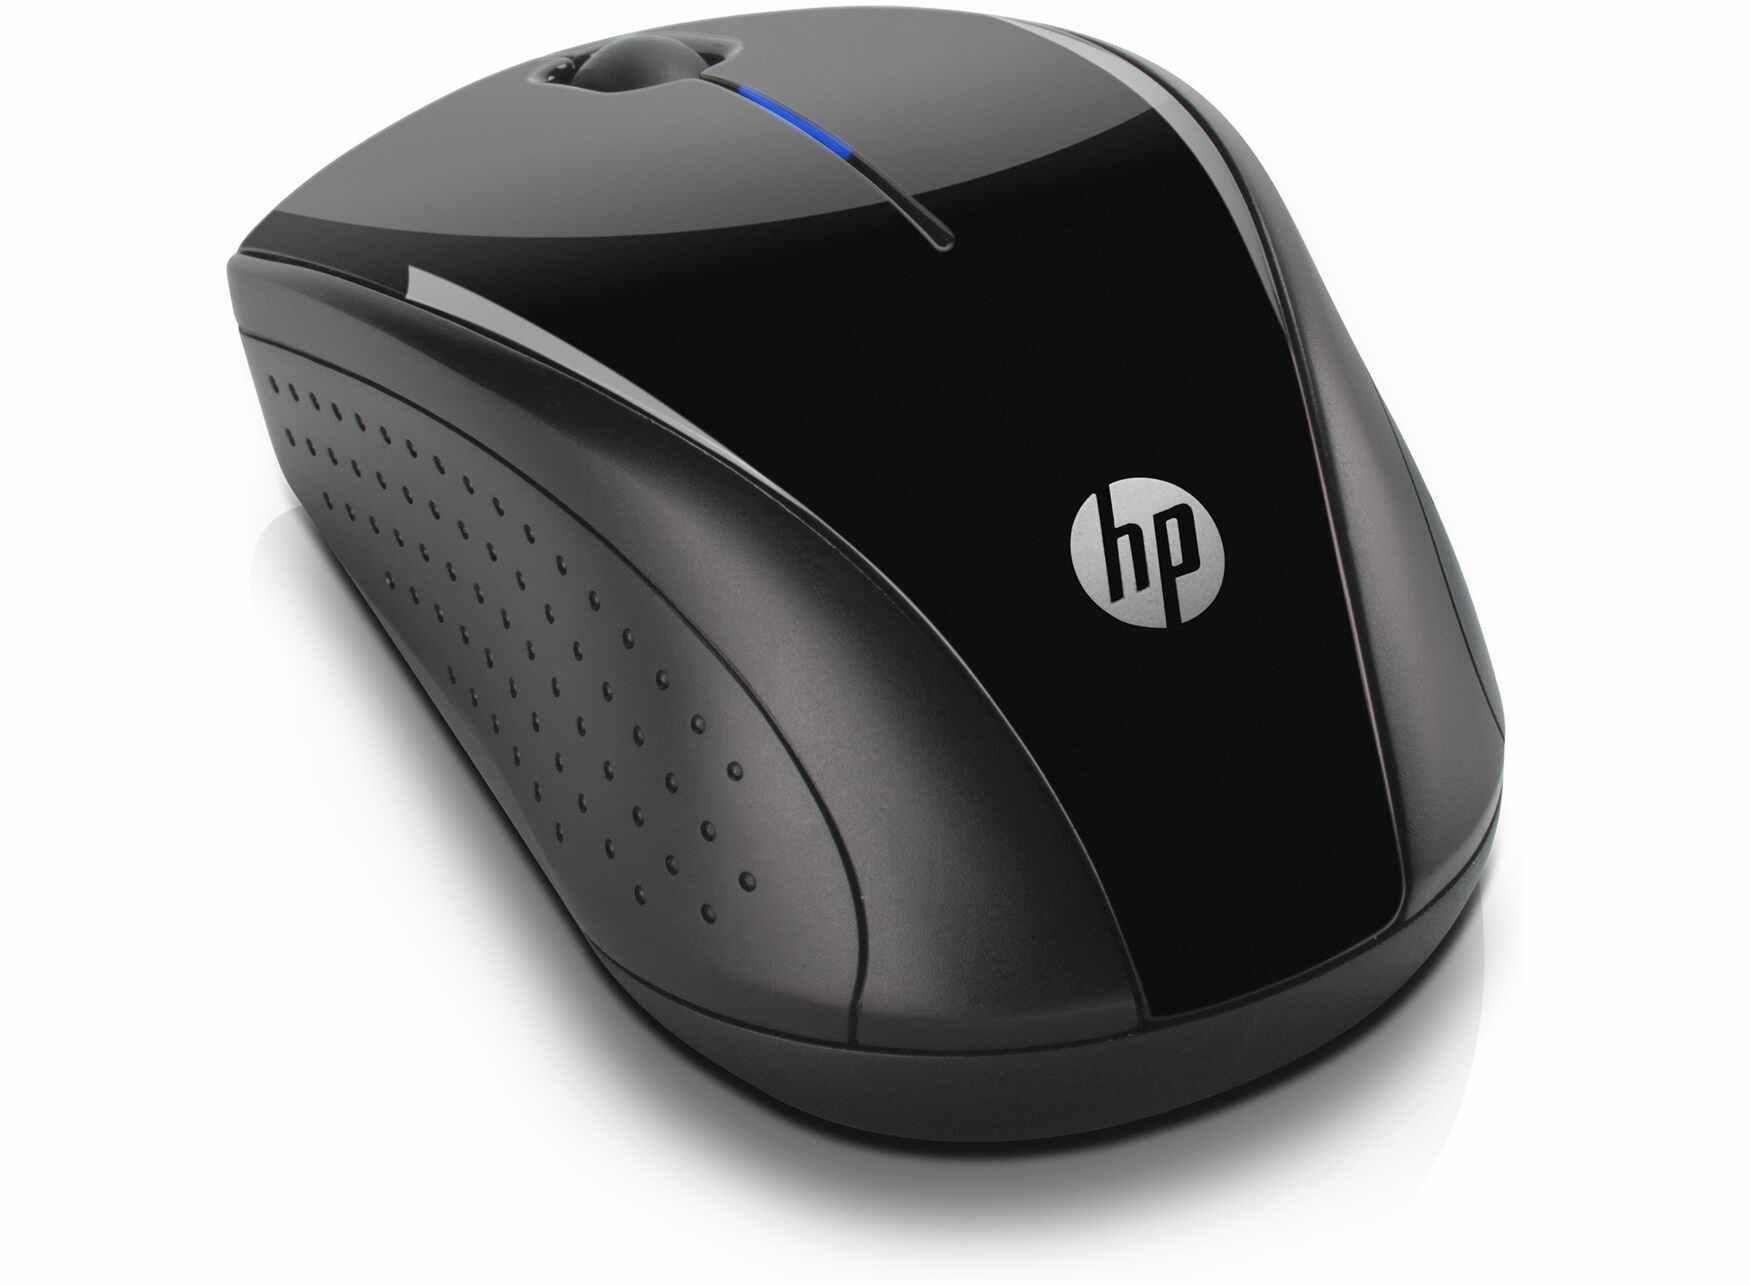 HP220